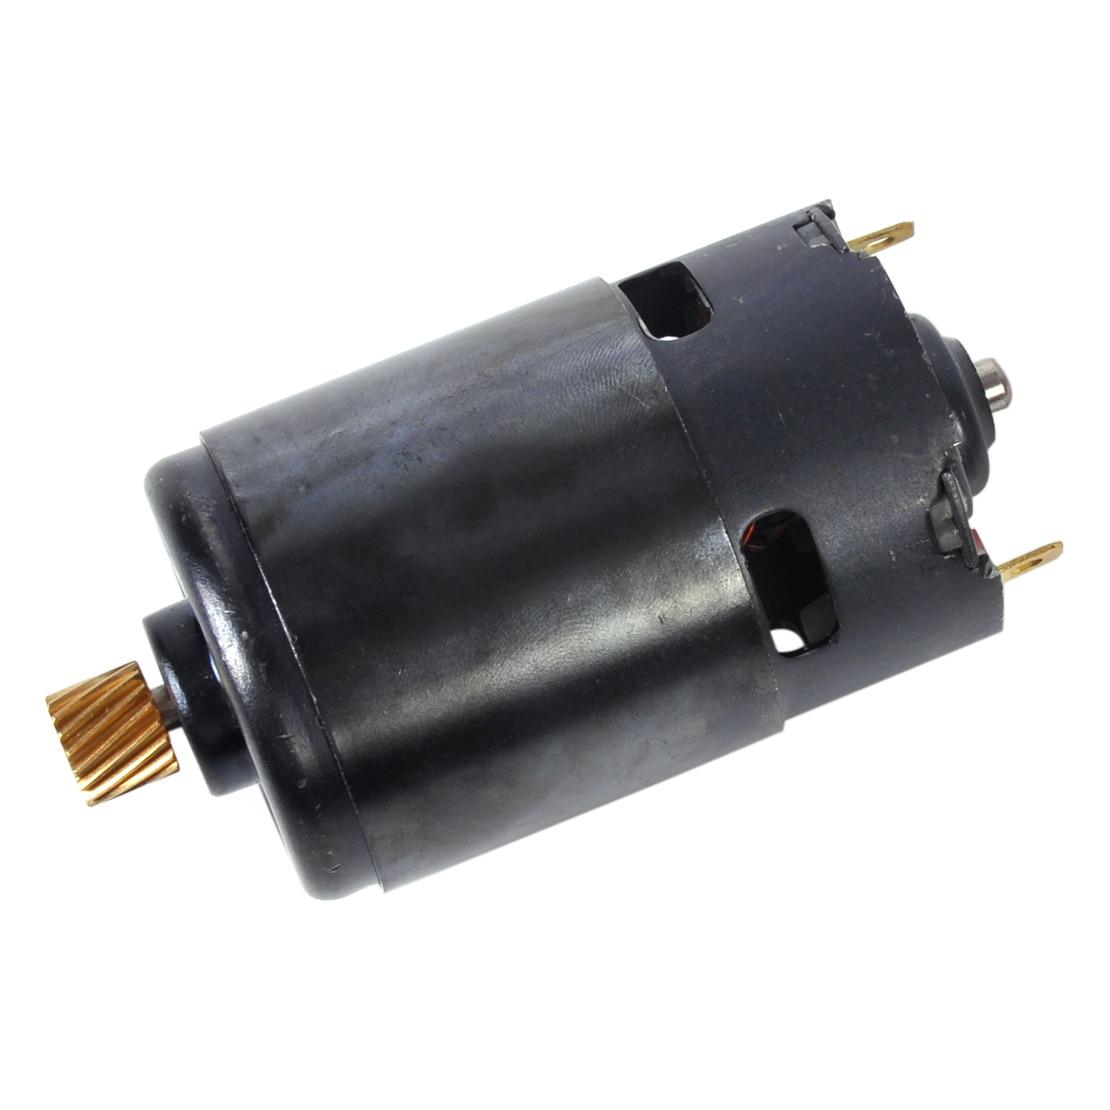 Citall 34436850289 стояночный тормоз привод ручной тормоз модуль двигателя для BMW X5 E70 X6 E71 E72 Benz S class W221 2007-2011 2012 2013